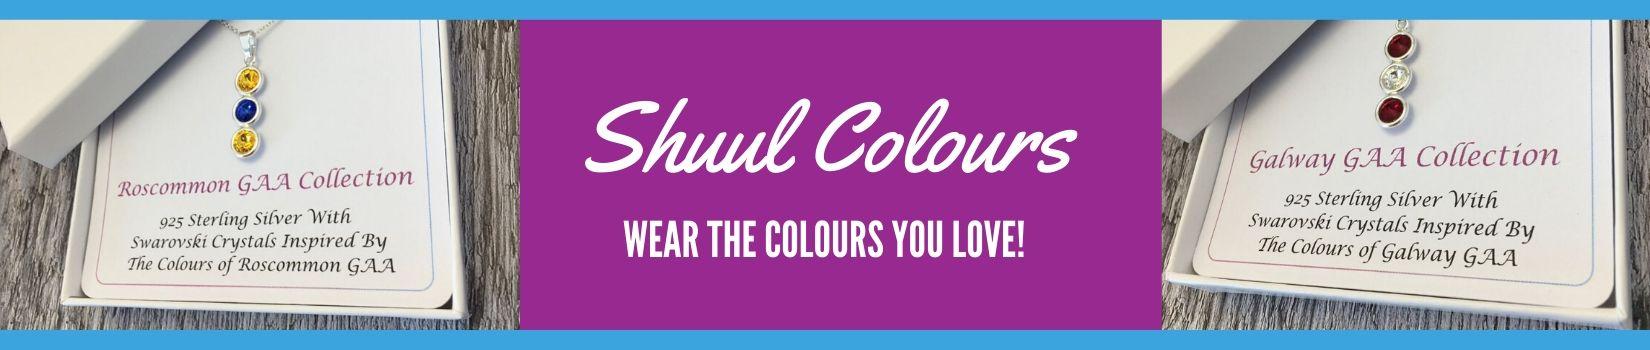 Shuul Colours